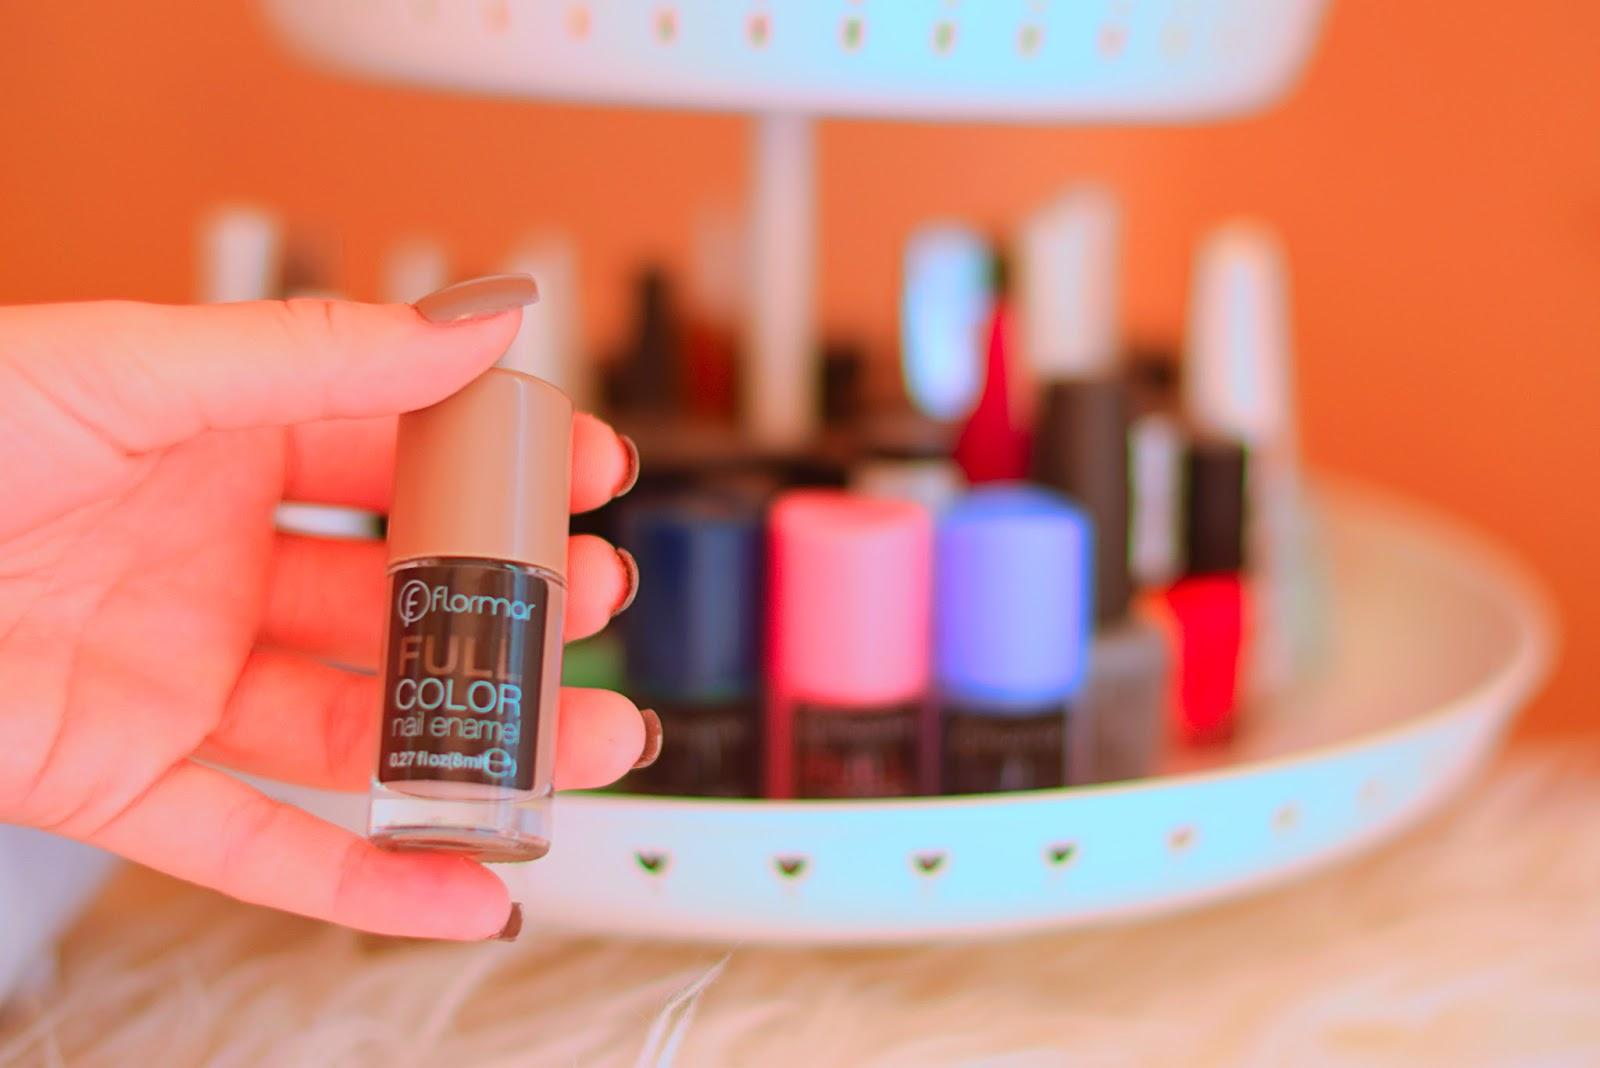 nery hdez, flormar, full color, nail enamel, pintarse las uñas